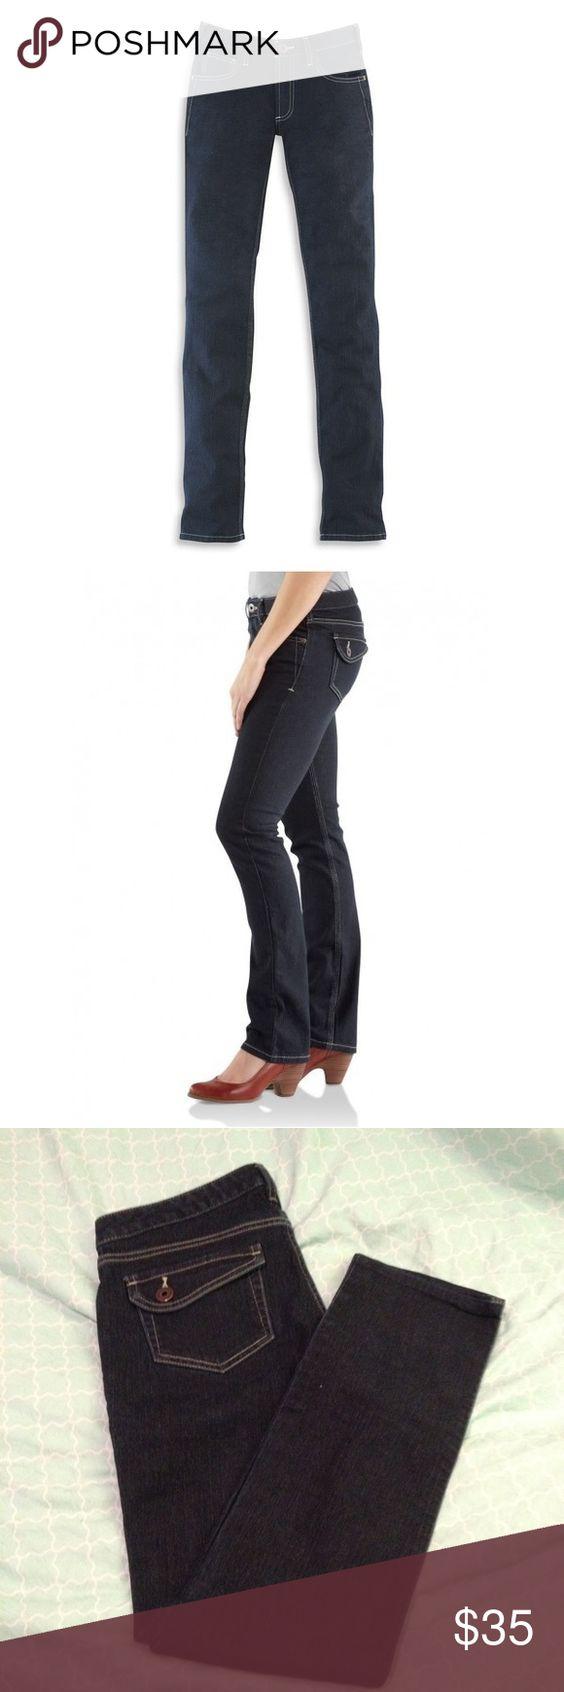 Carhartt Jeans Dark Wash modern fit carhartt jeans for women. Brand new never worn. Carhartt Jeans